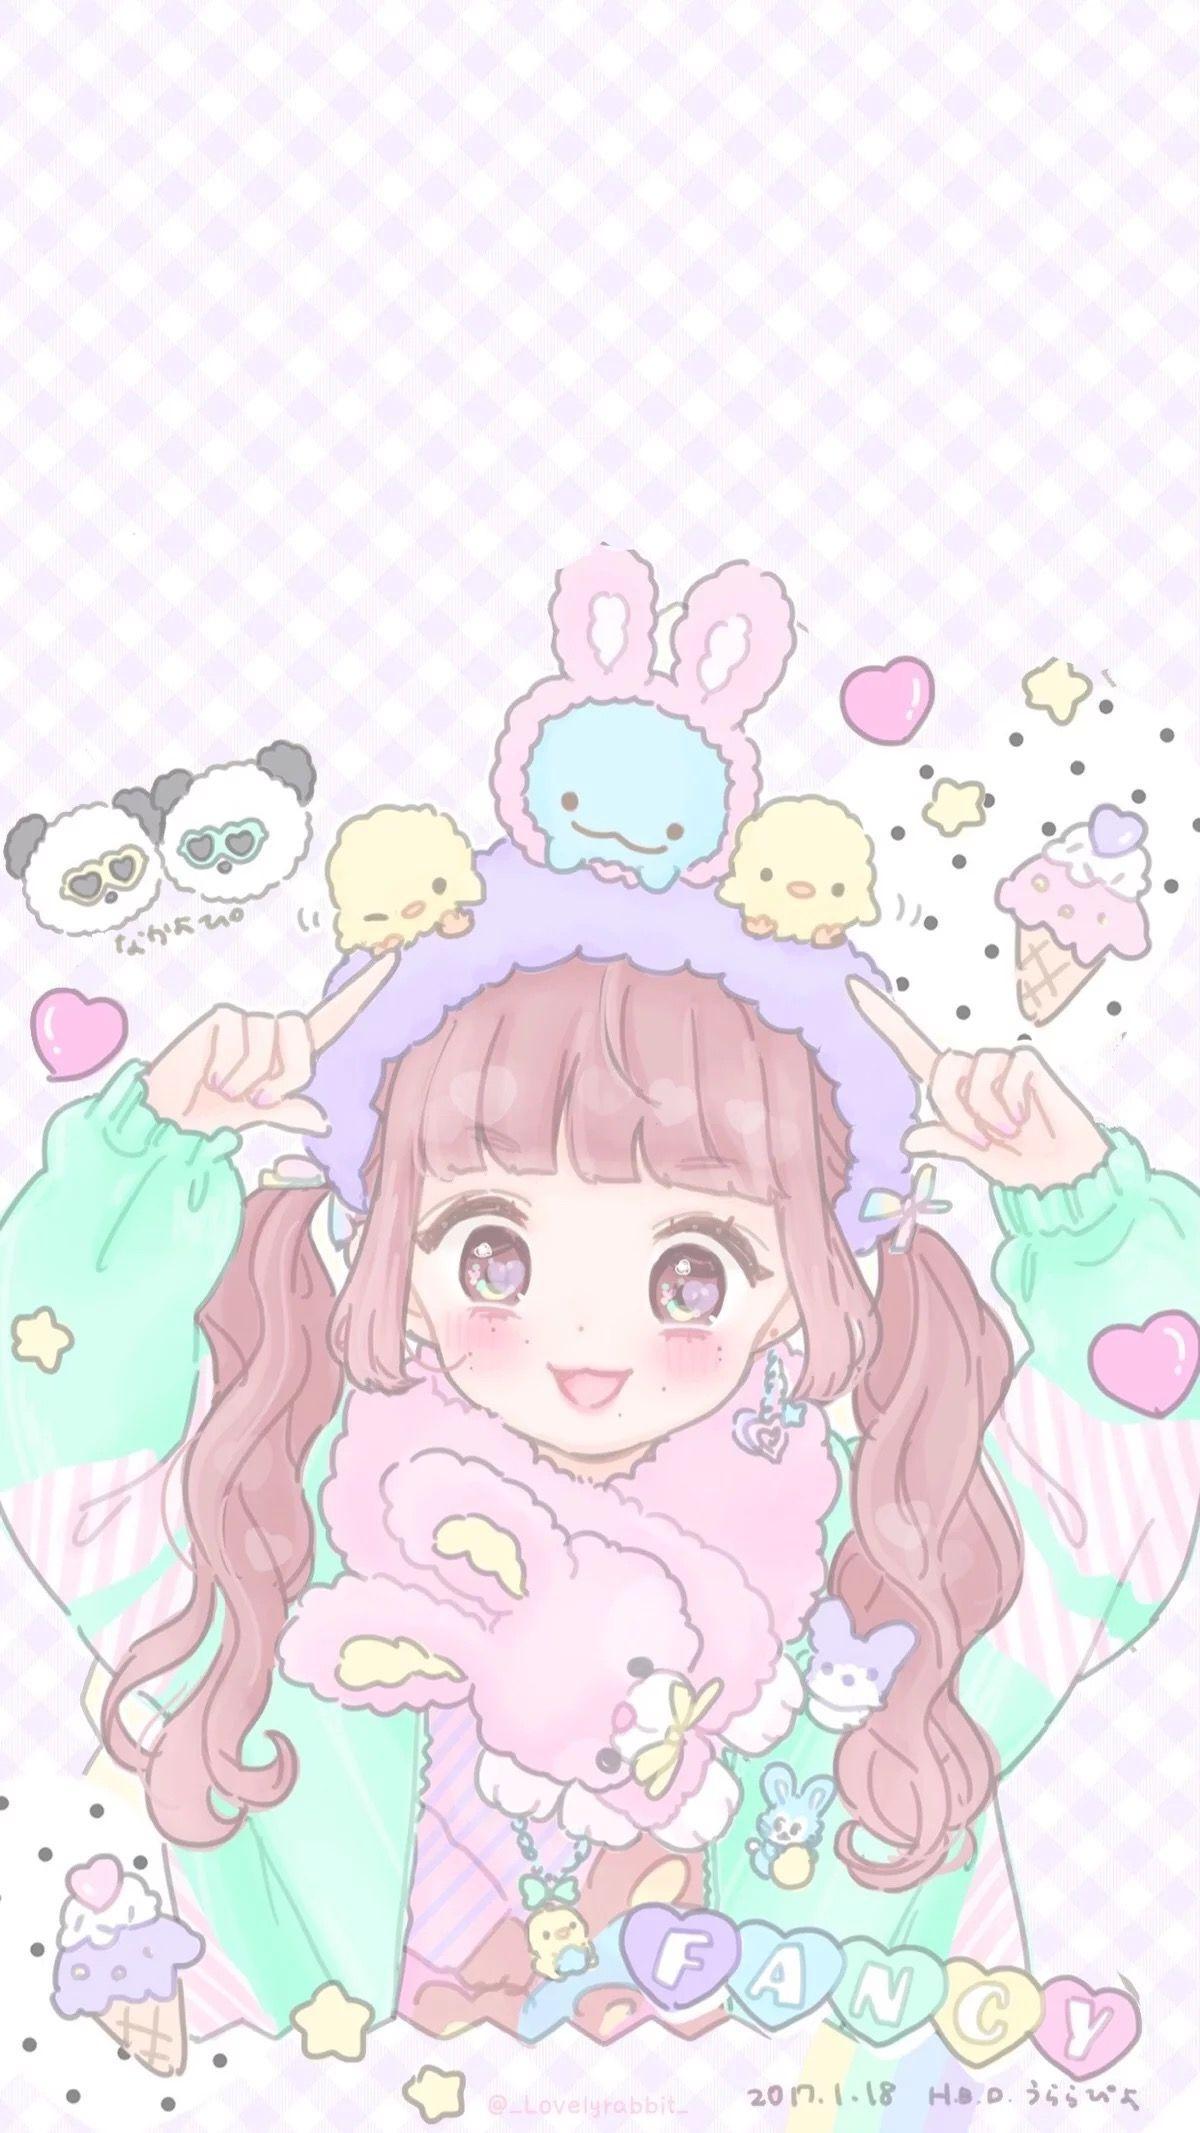 Pastel Anime Wallpapers - Top Free Pastel Anime ...